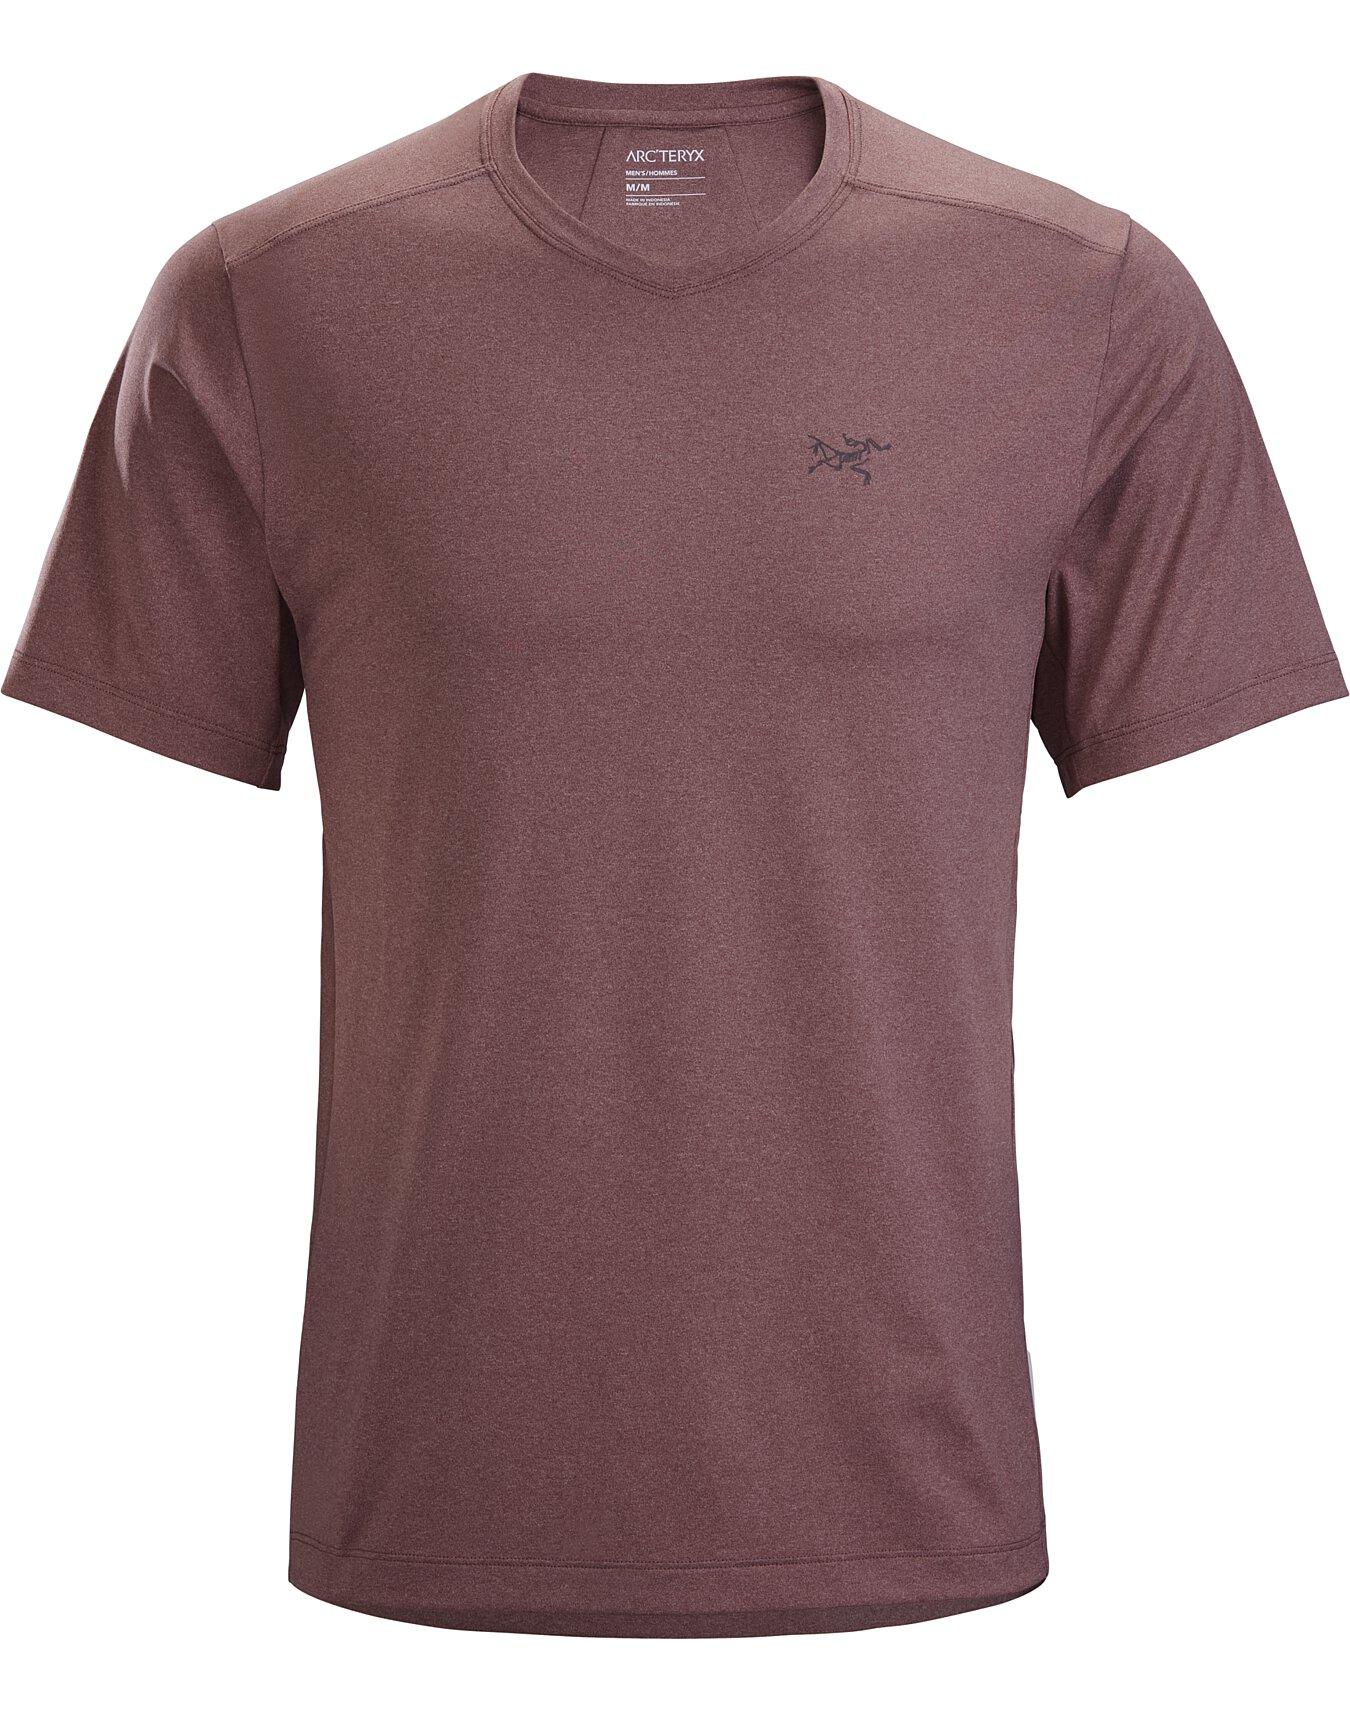 Remige Shirt SS Men's